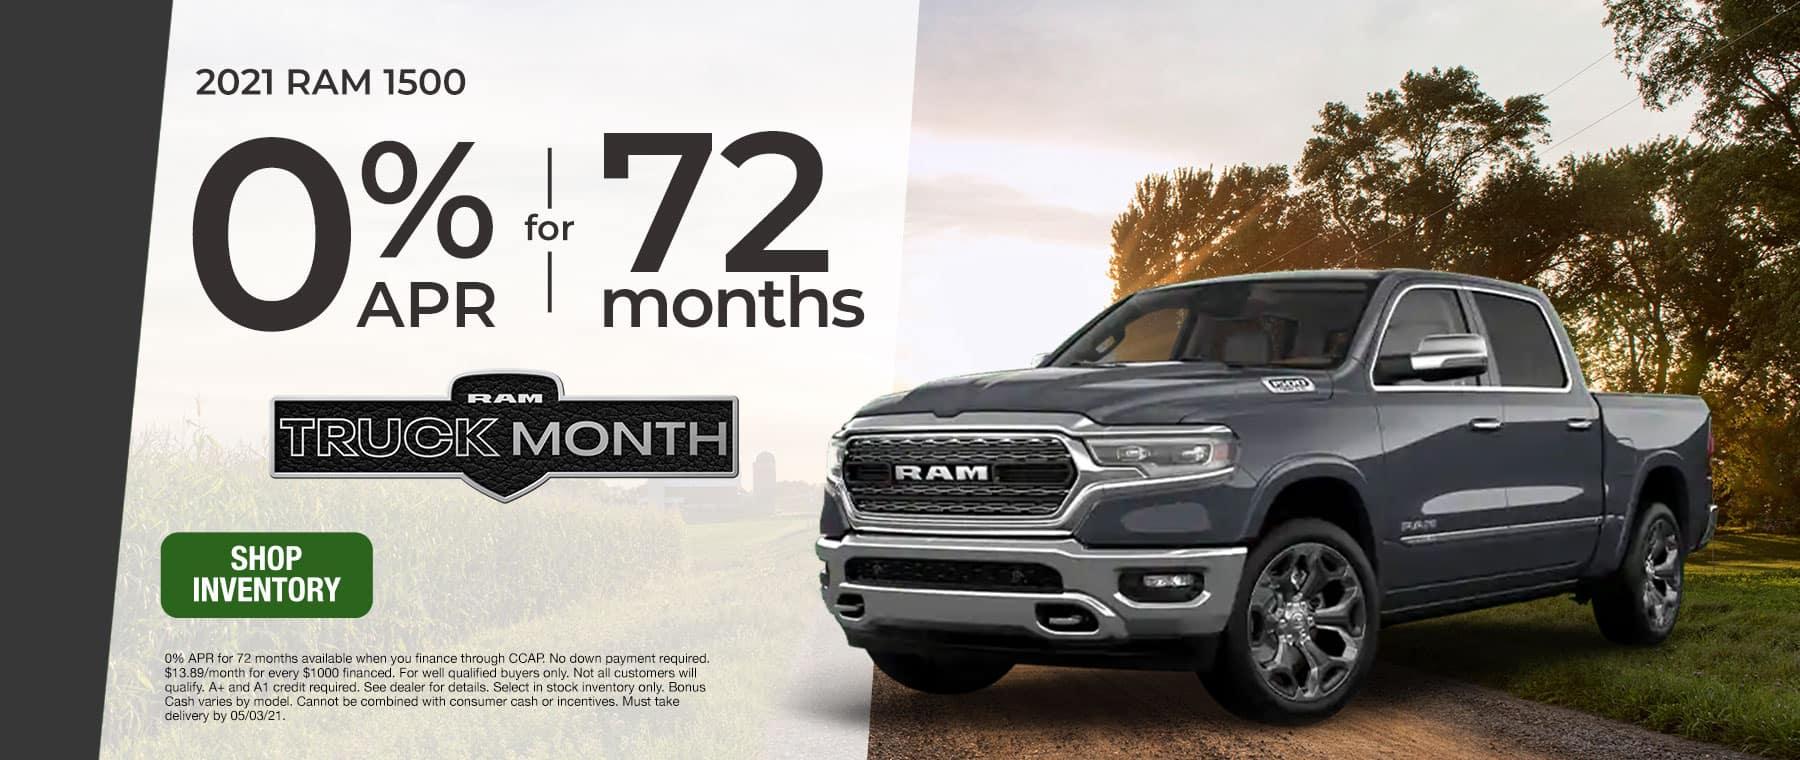 2021 RAM 1500 – 0% APR for 72 Months